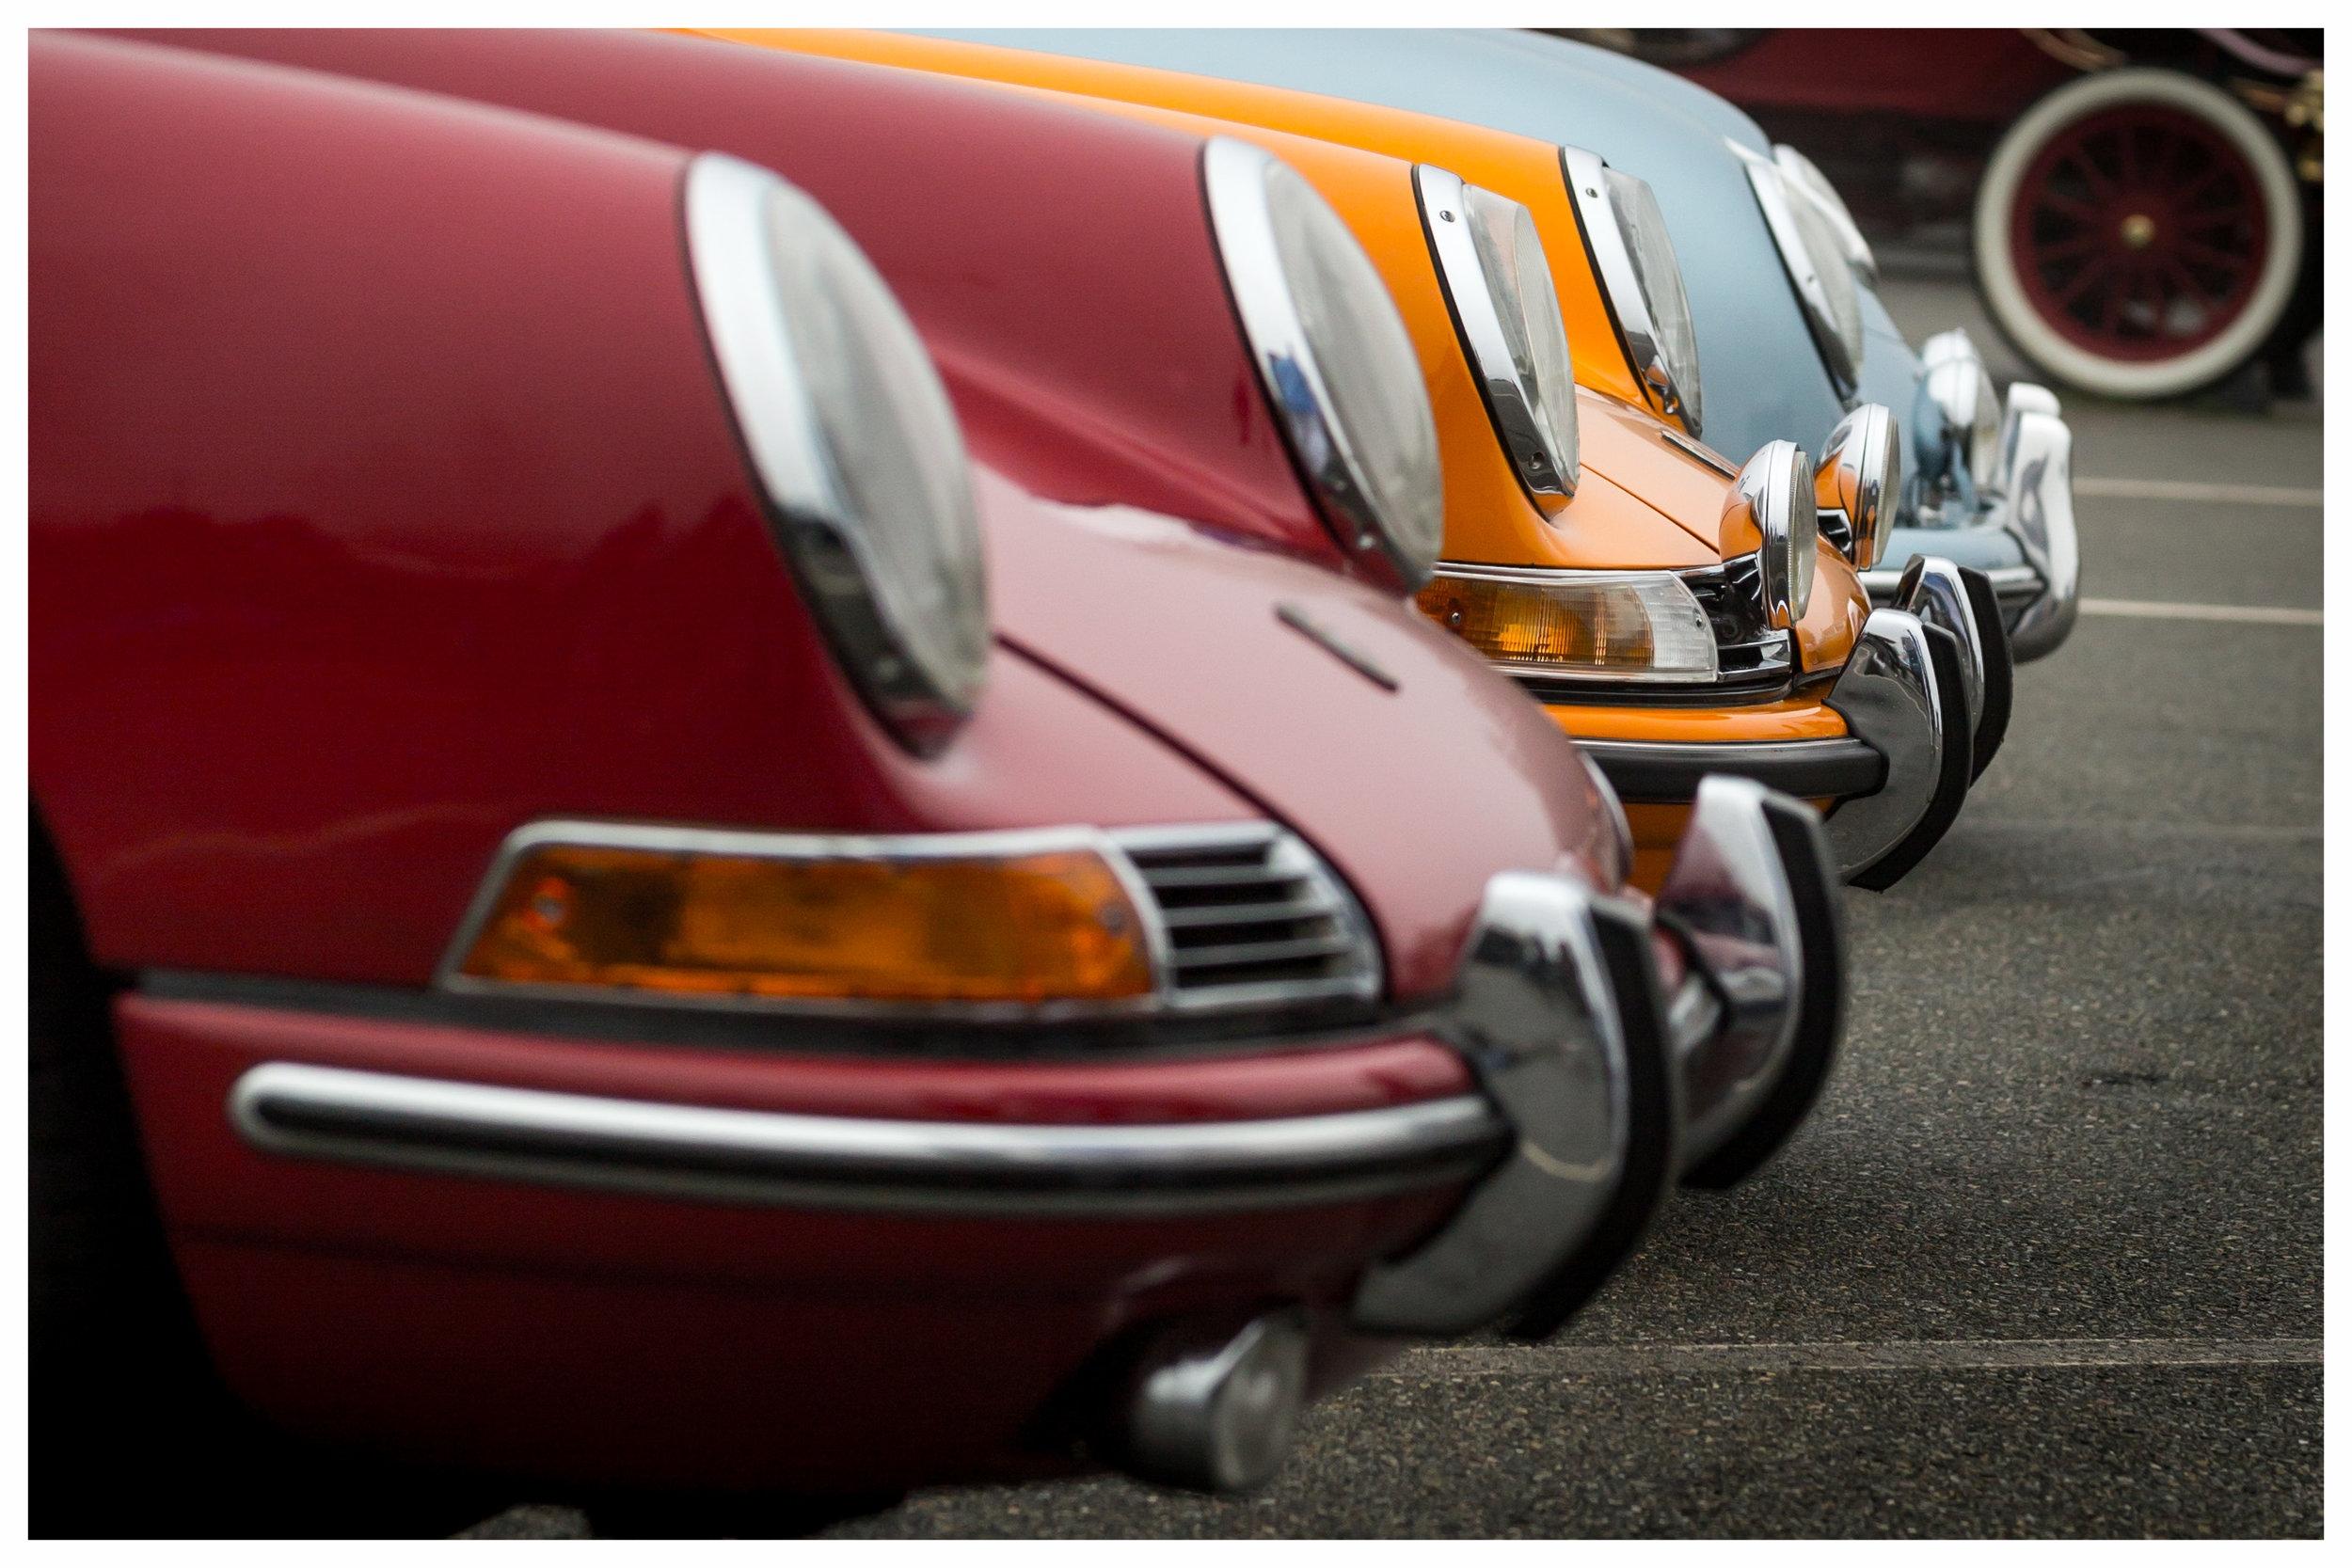 Barrett Jackson Car Show-9.jpg